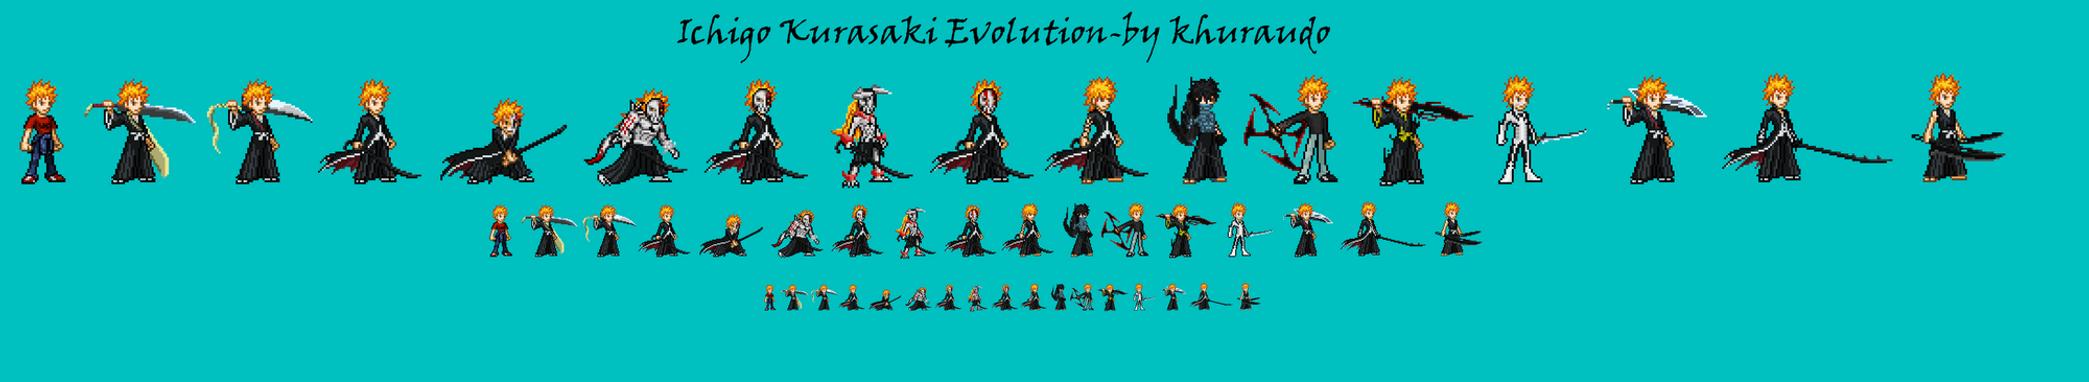 Ichigo Kurosaki Evolution by khuraudo by khuraudo